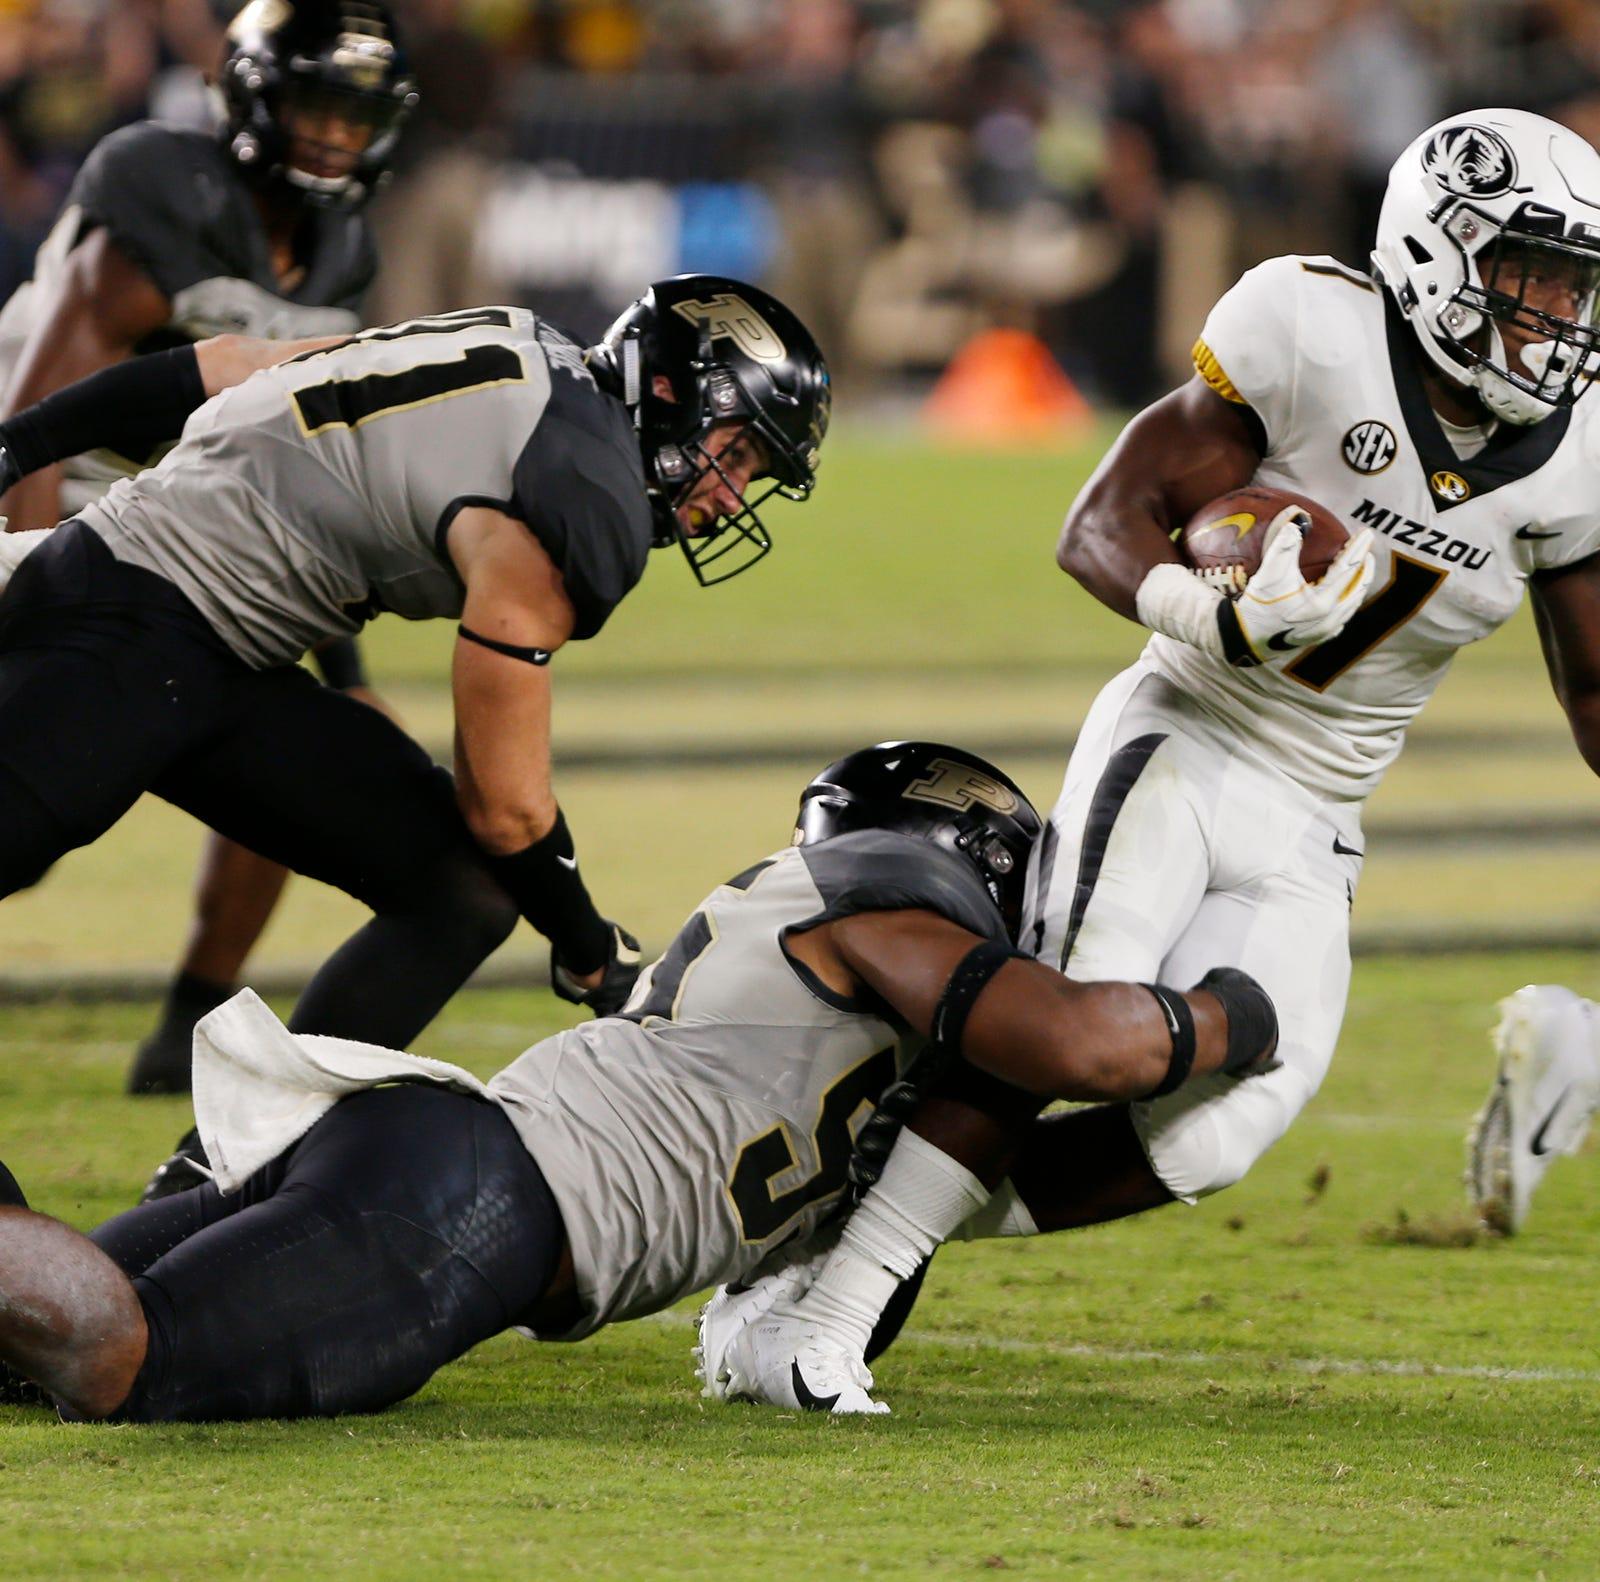 Purdue linebacker Derrick Barnes brings down Khmari Thompson of Missouri Saturday, September 15, 2018, in West Lafayette. Purdue lost 40-37 on a Missouri field goal as time expired.